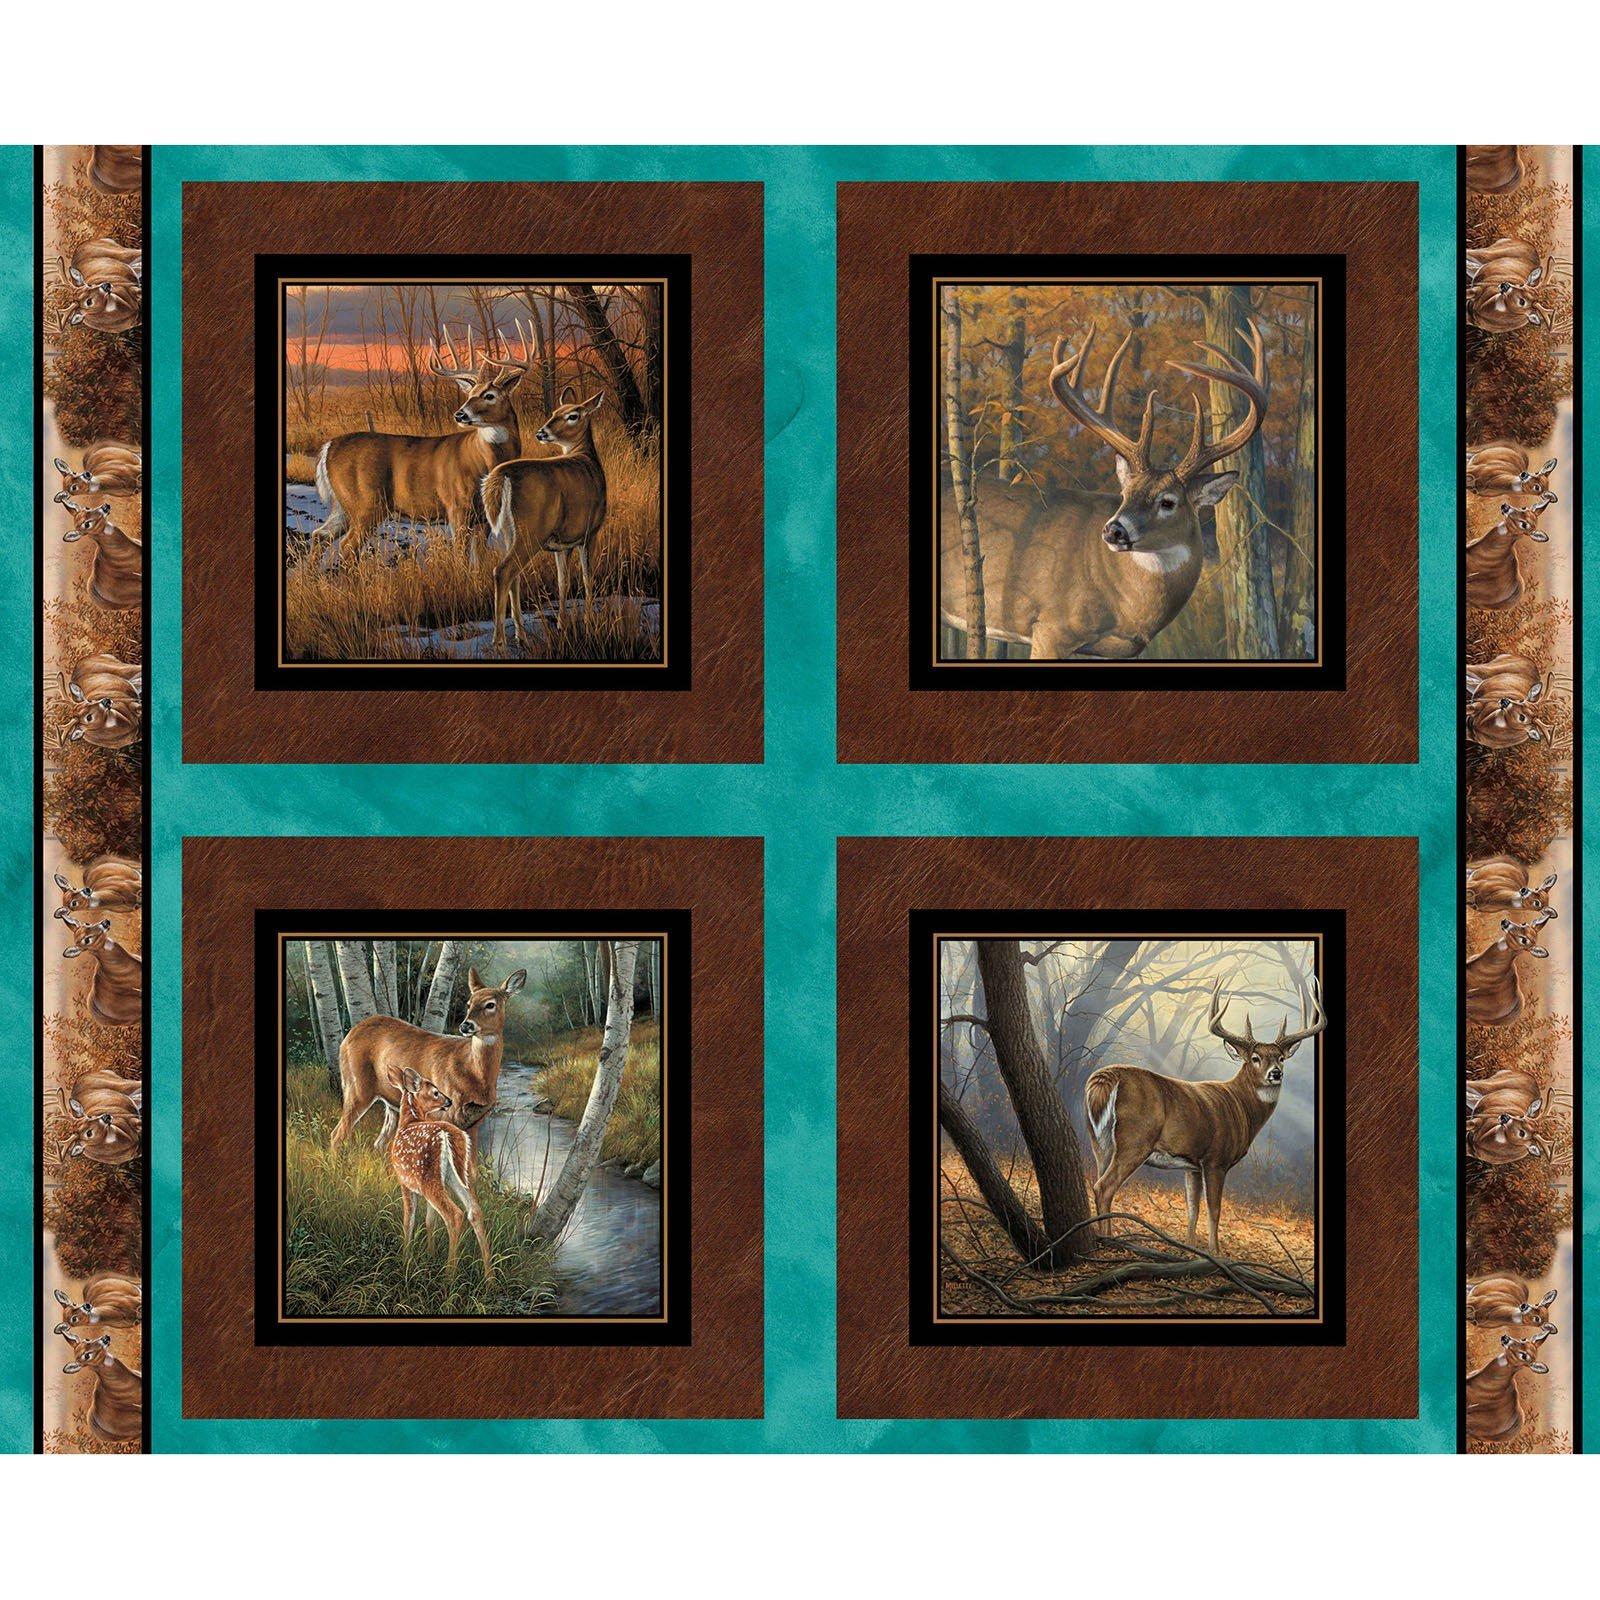 Field Day Deer Pillow Panel<br/>Springs Creative 68410-216